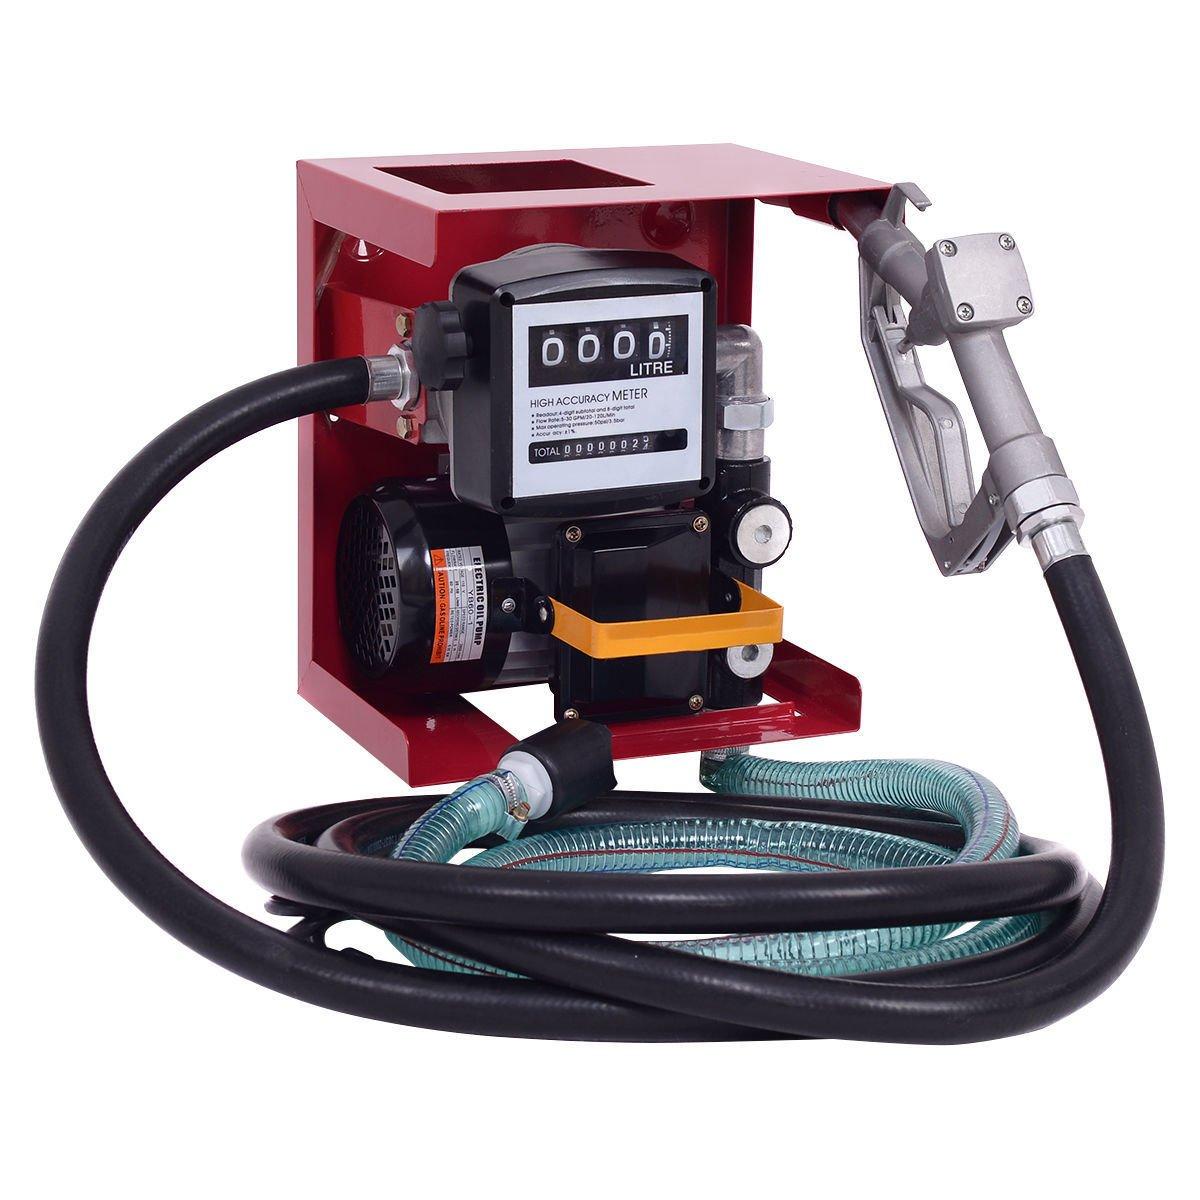 Cheap Vw Touareg Electric Fuel Pump 7l0919087e Find New Gas With Sending Unit Volkswagen Beetle Get Quotations Goplus 110v Diesel Oil Transfer W Meter 13 Hose